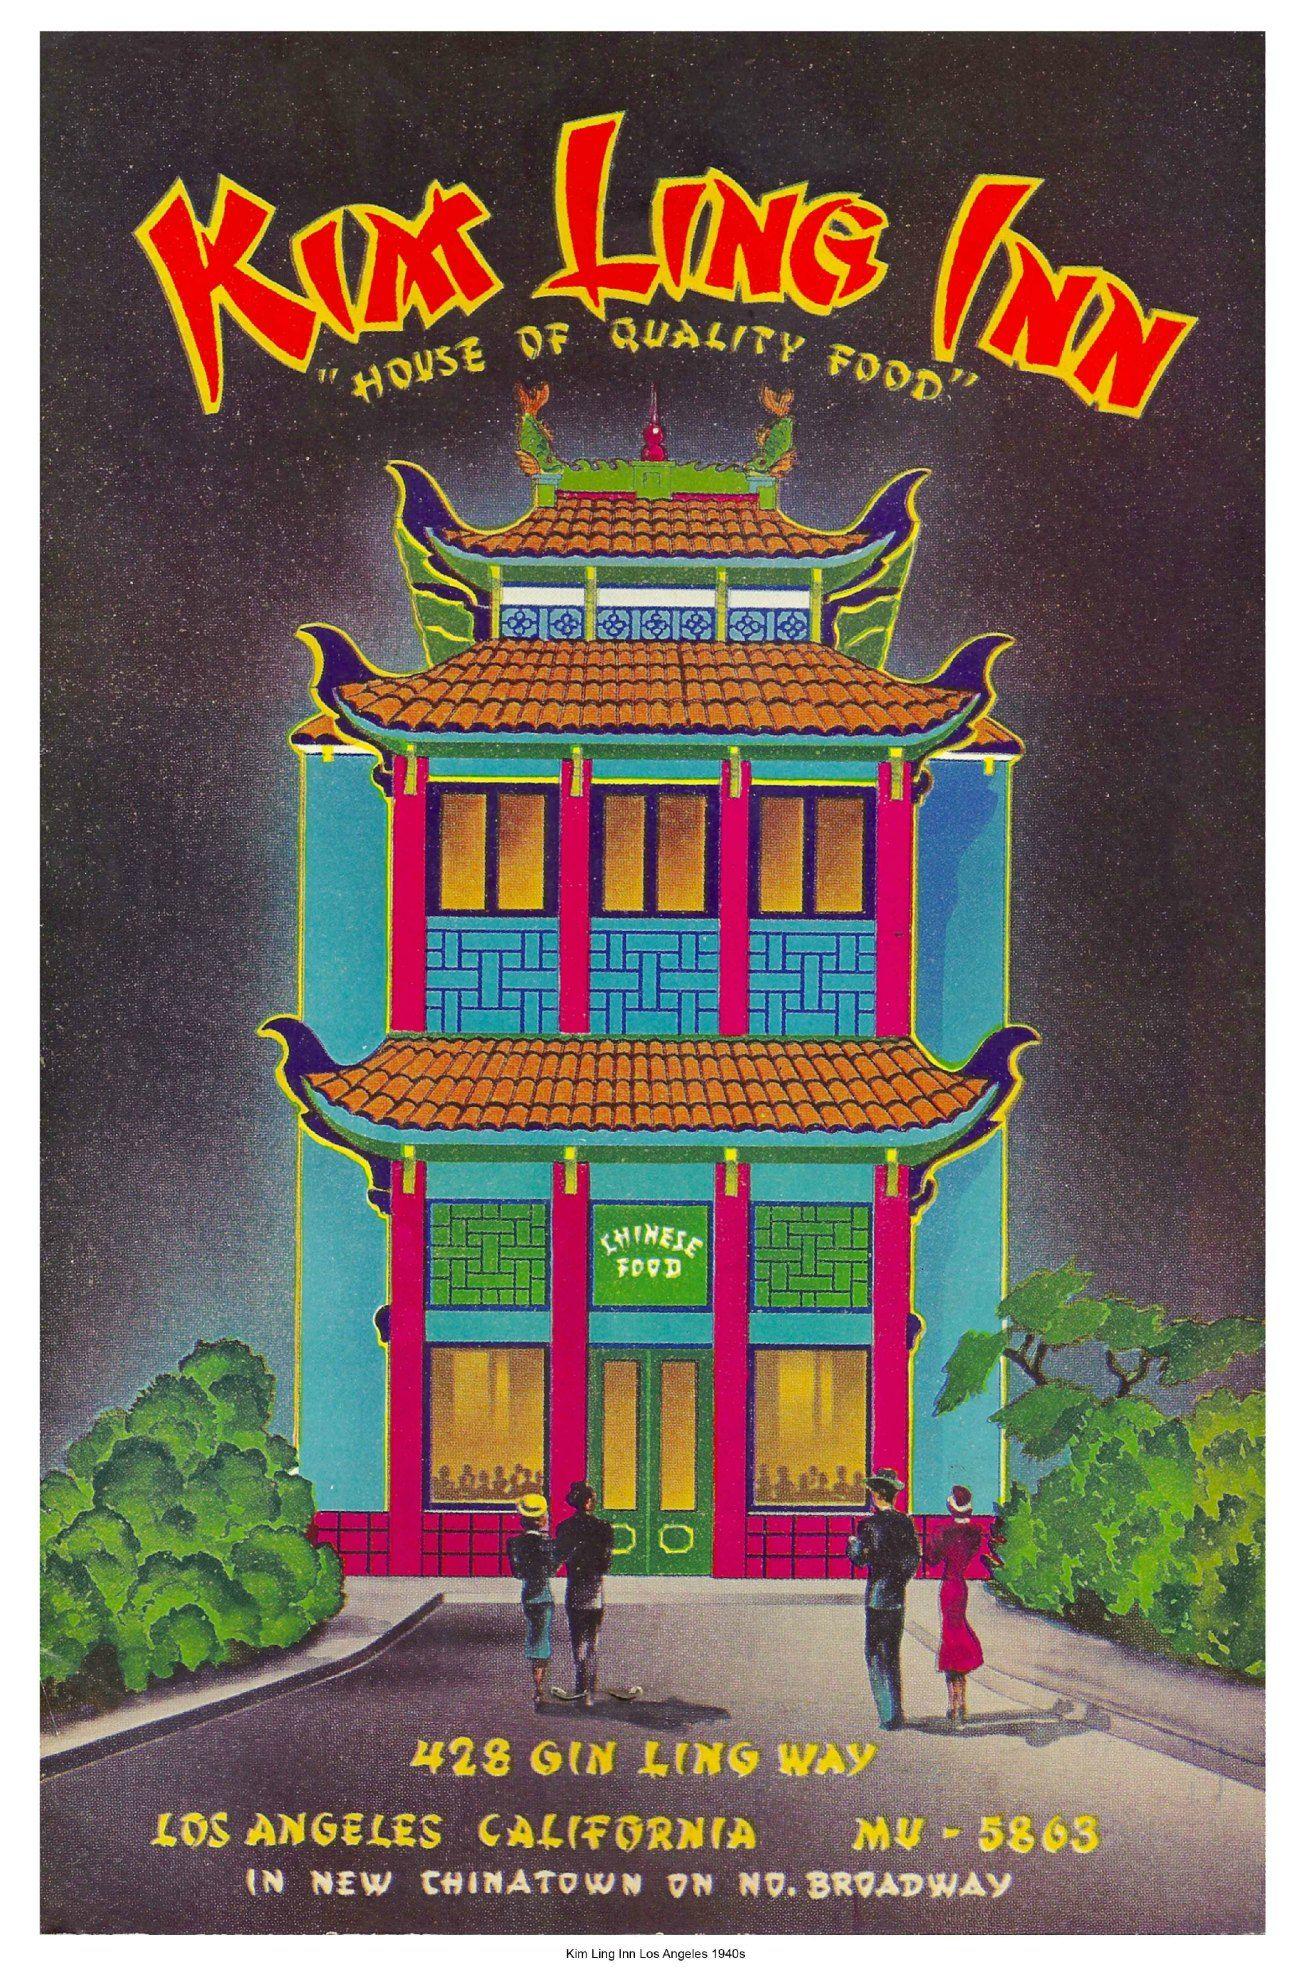 Kim ling inn los angeles 1940s chinese menu vintage